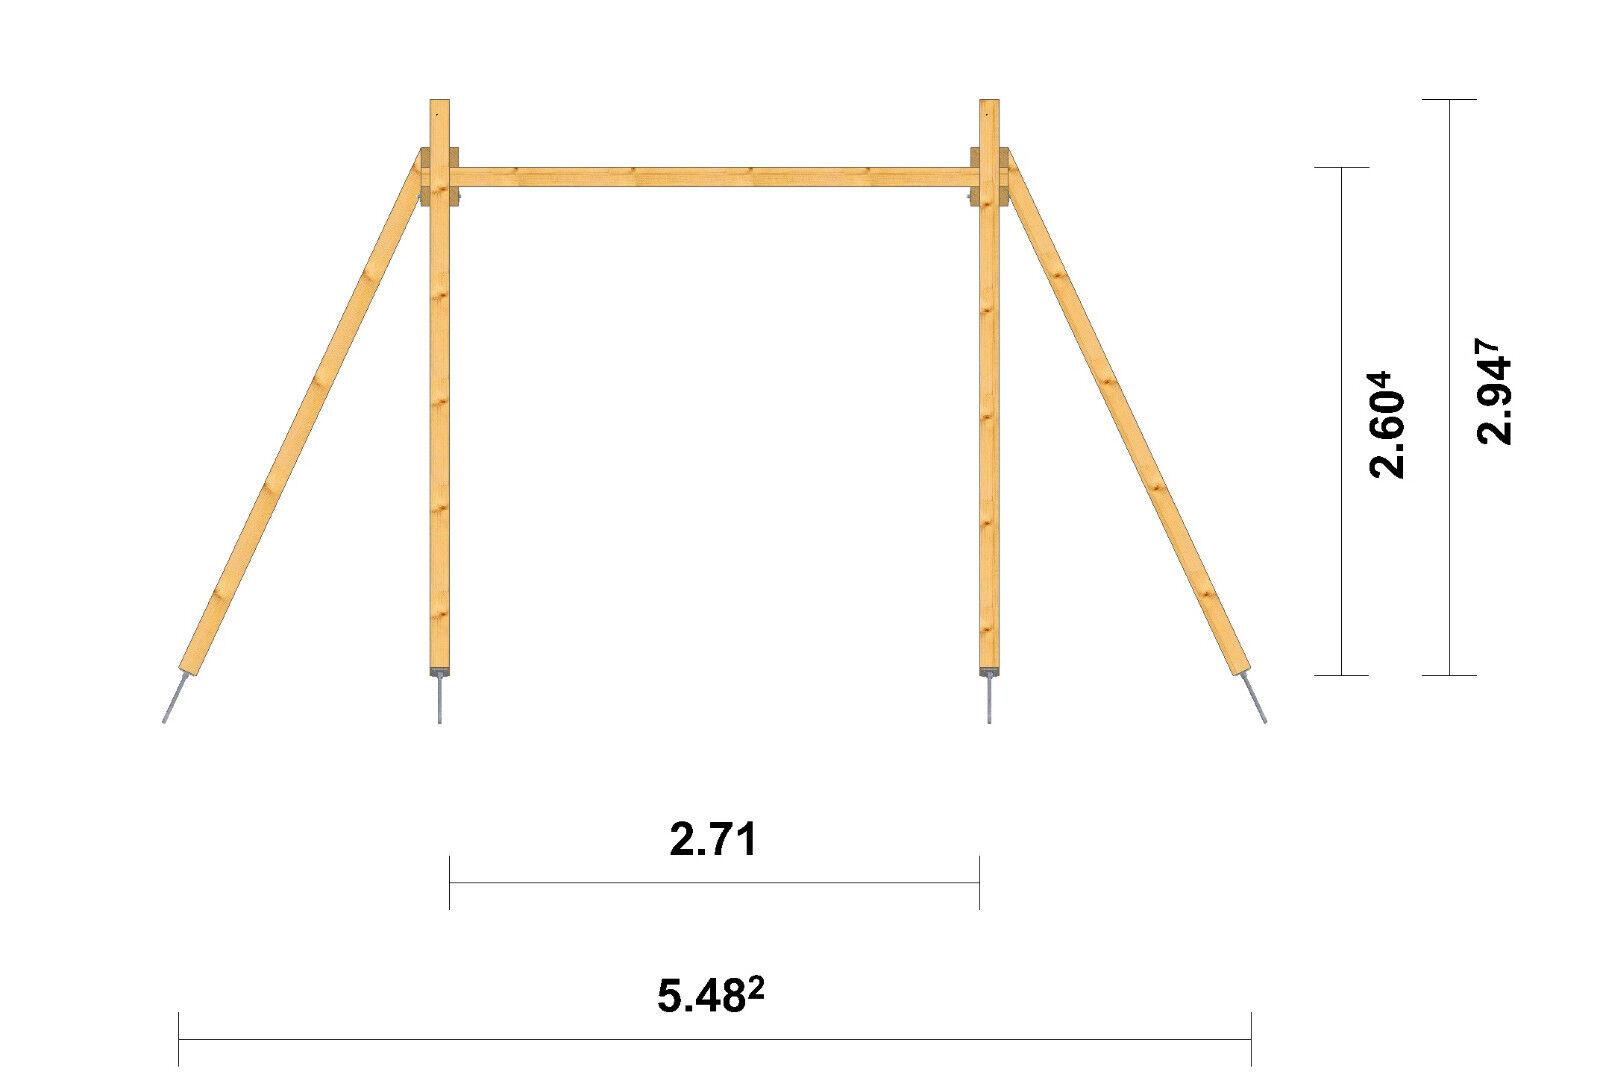 Schaukelgerüst extrem stabil Schaukel Pfosten 12x12 Holzschaukel Holzschaukel Holzschaukel Doppelschaukel c9ec98